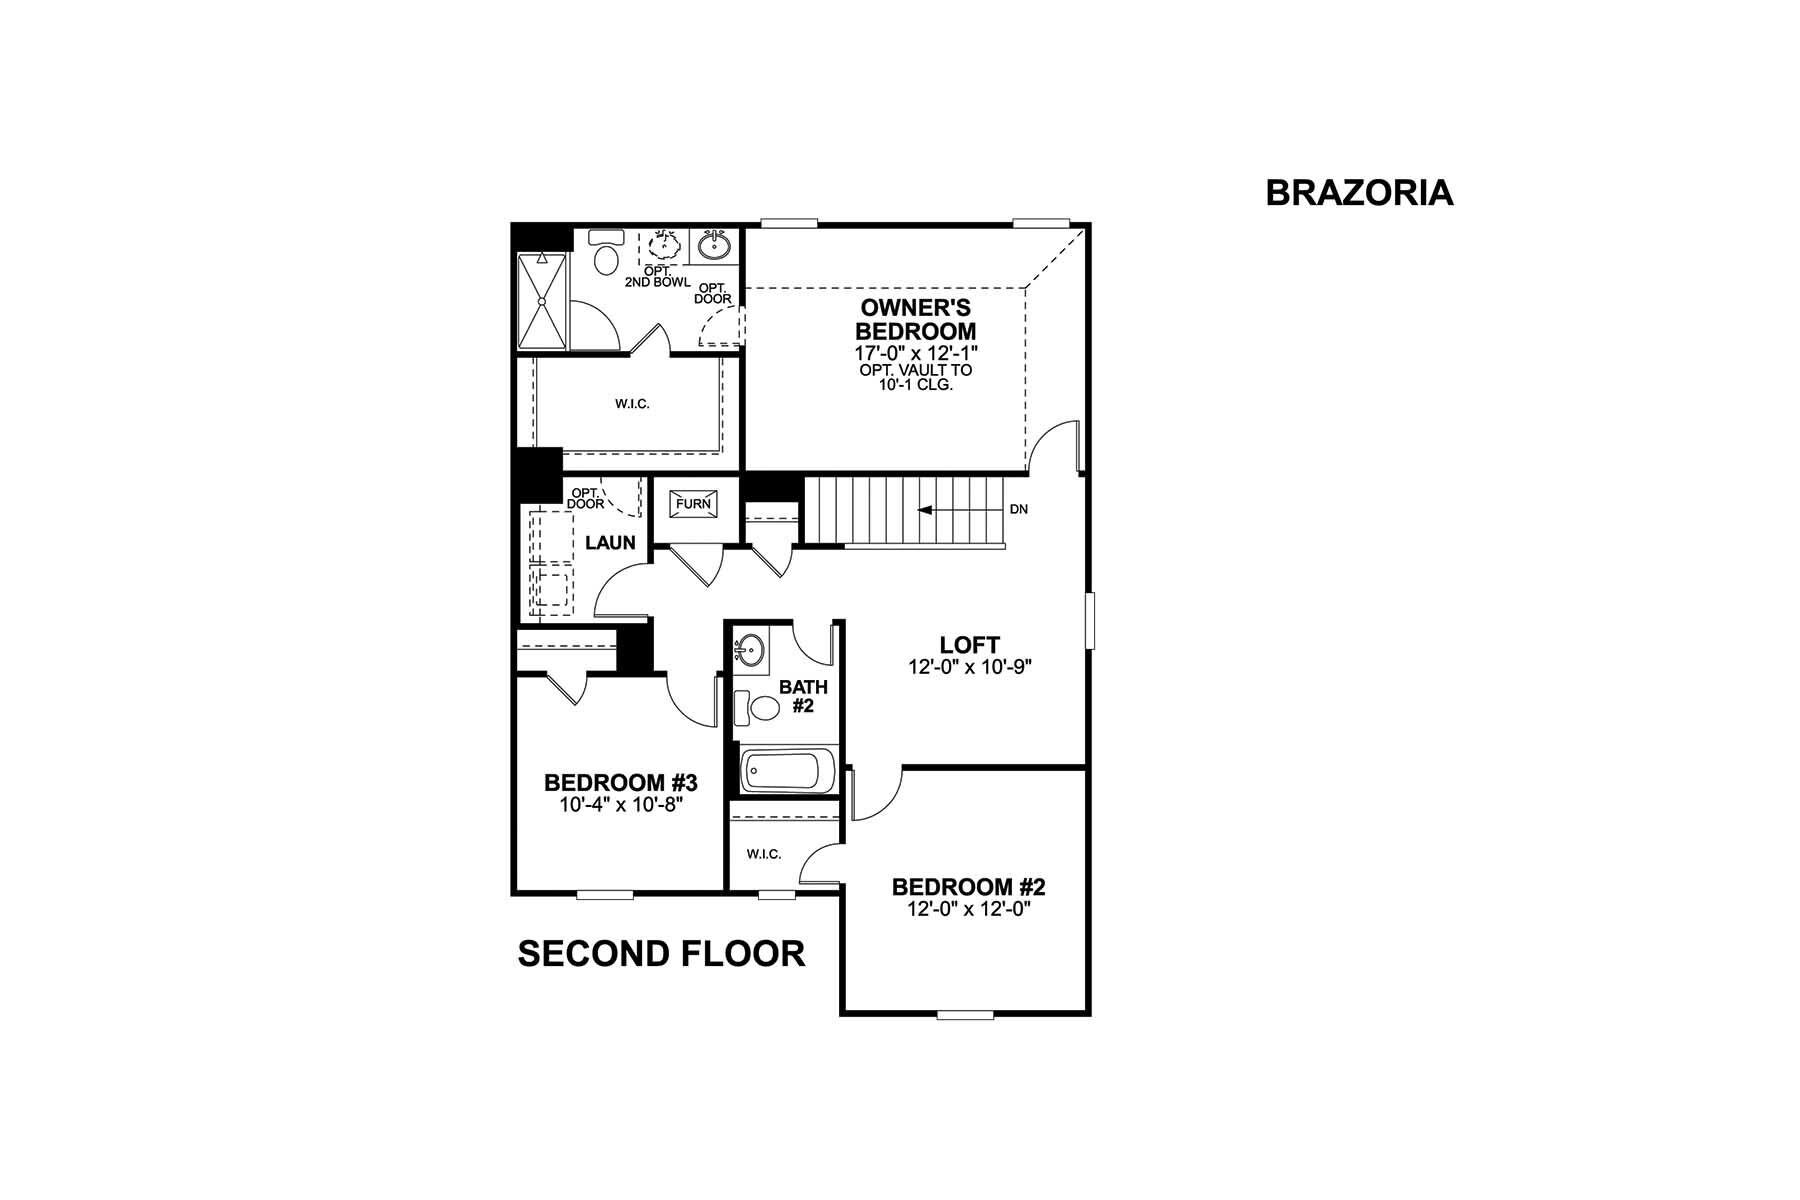 Brazoria Second Floor